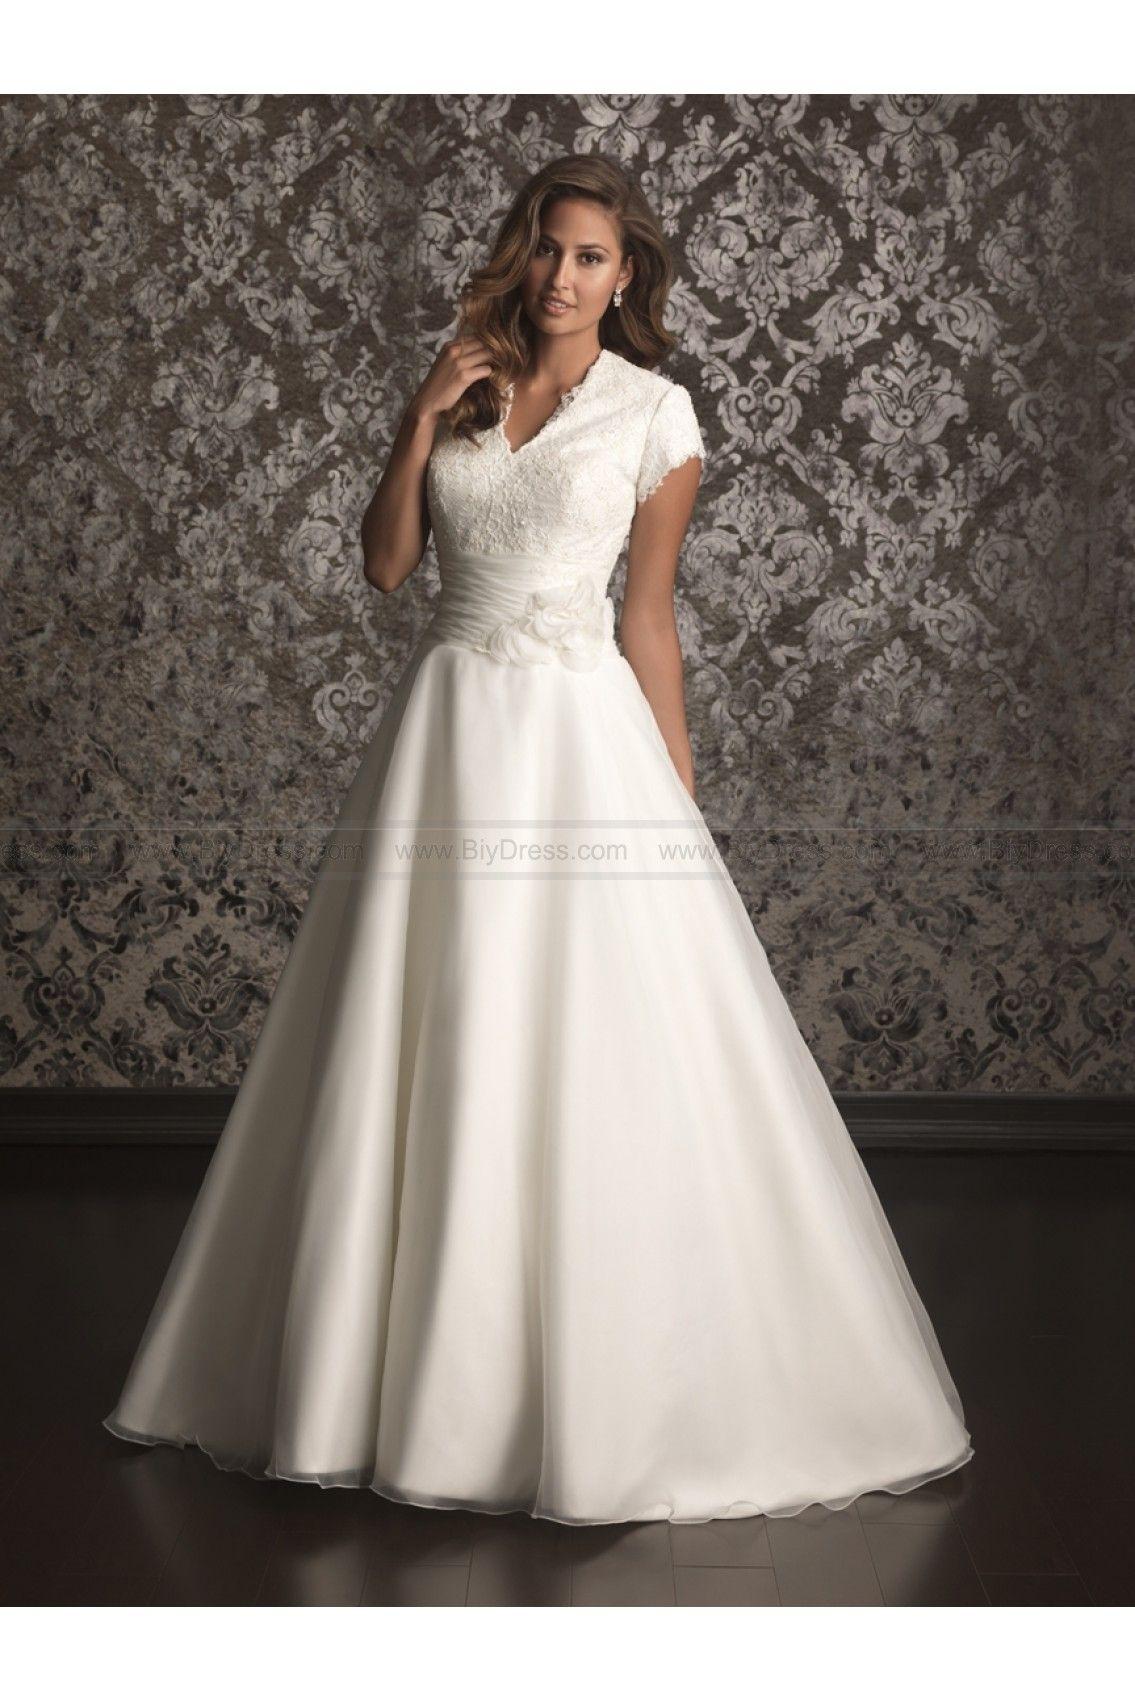 Allure modest wedding dresses style m brides pinterest